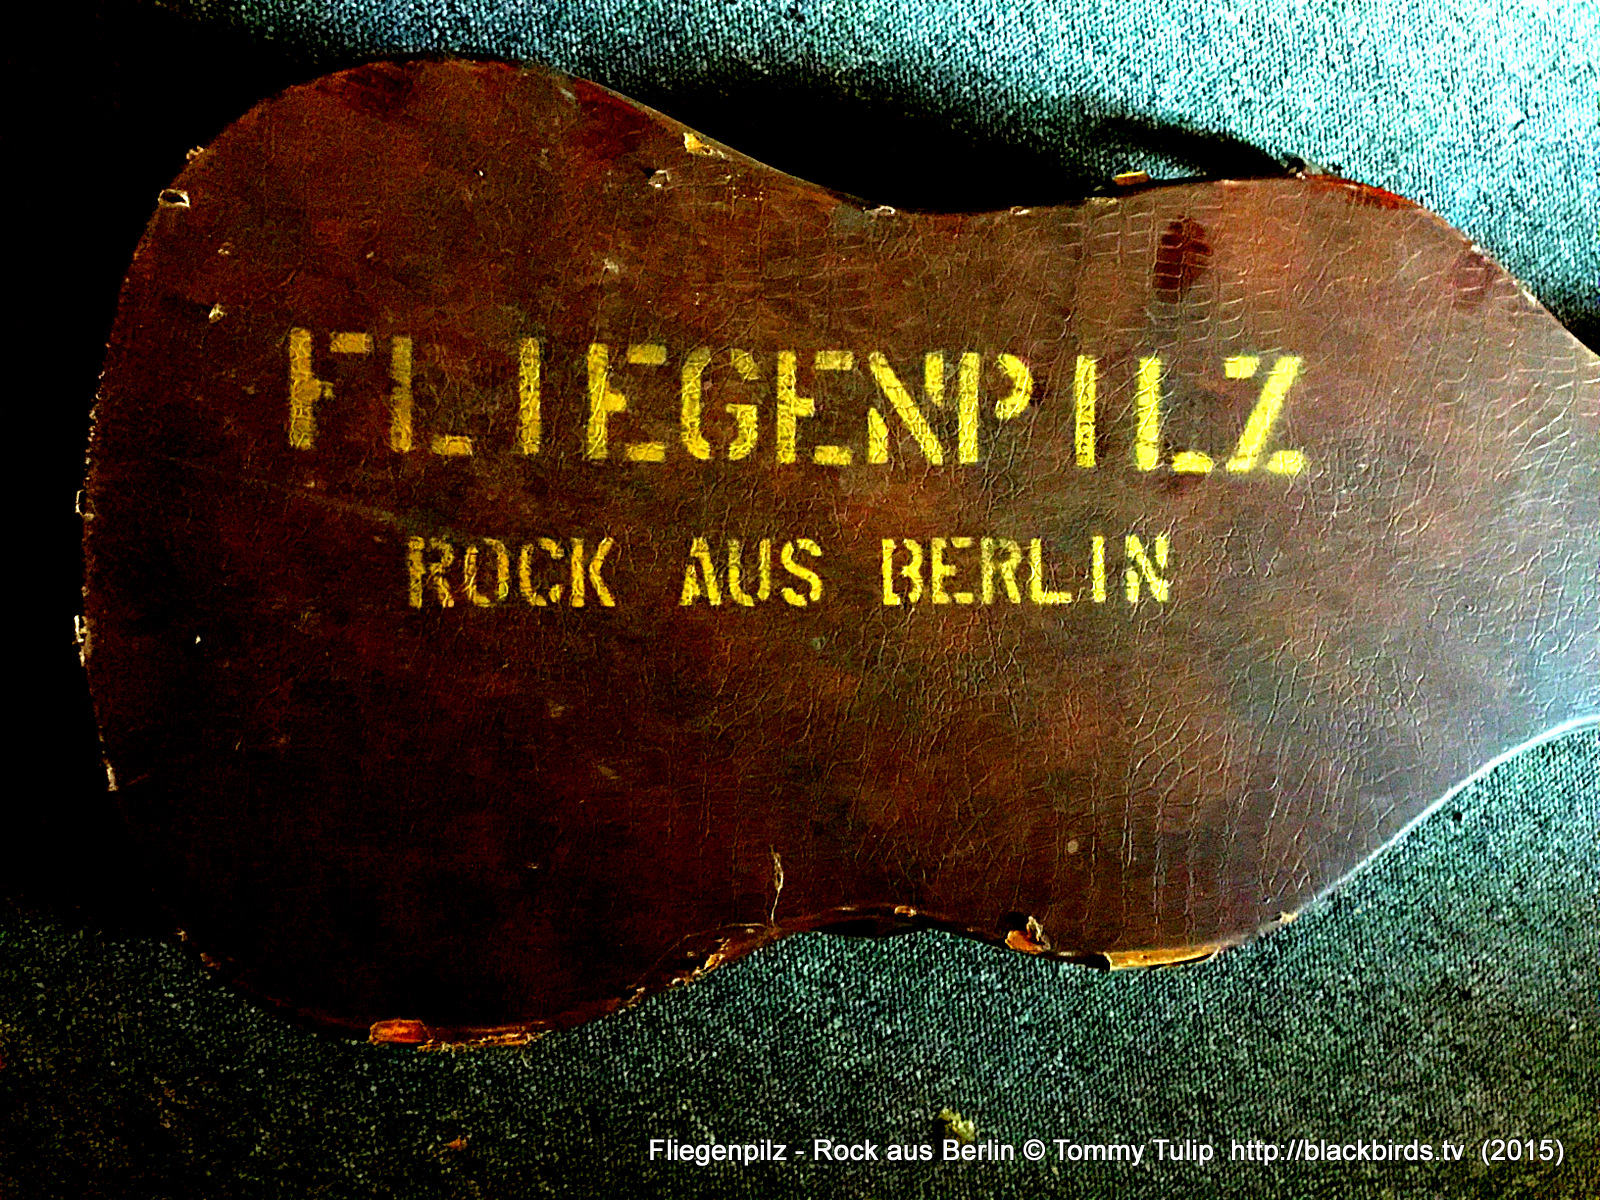 Fliegenpilz - Rock aus Berlin